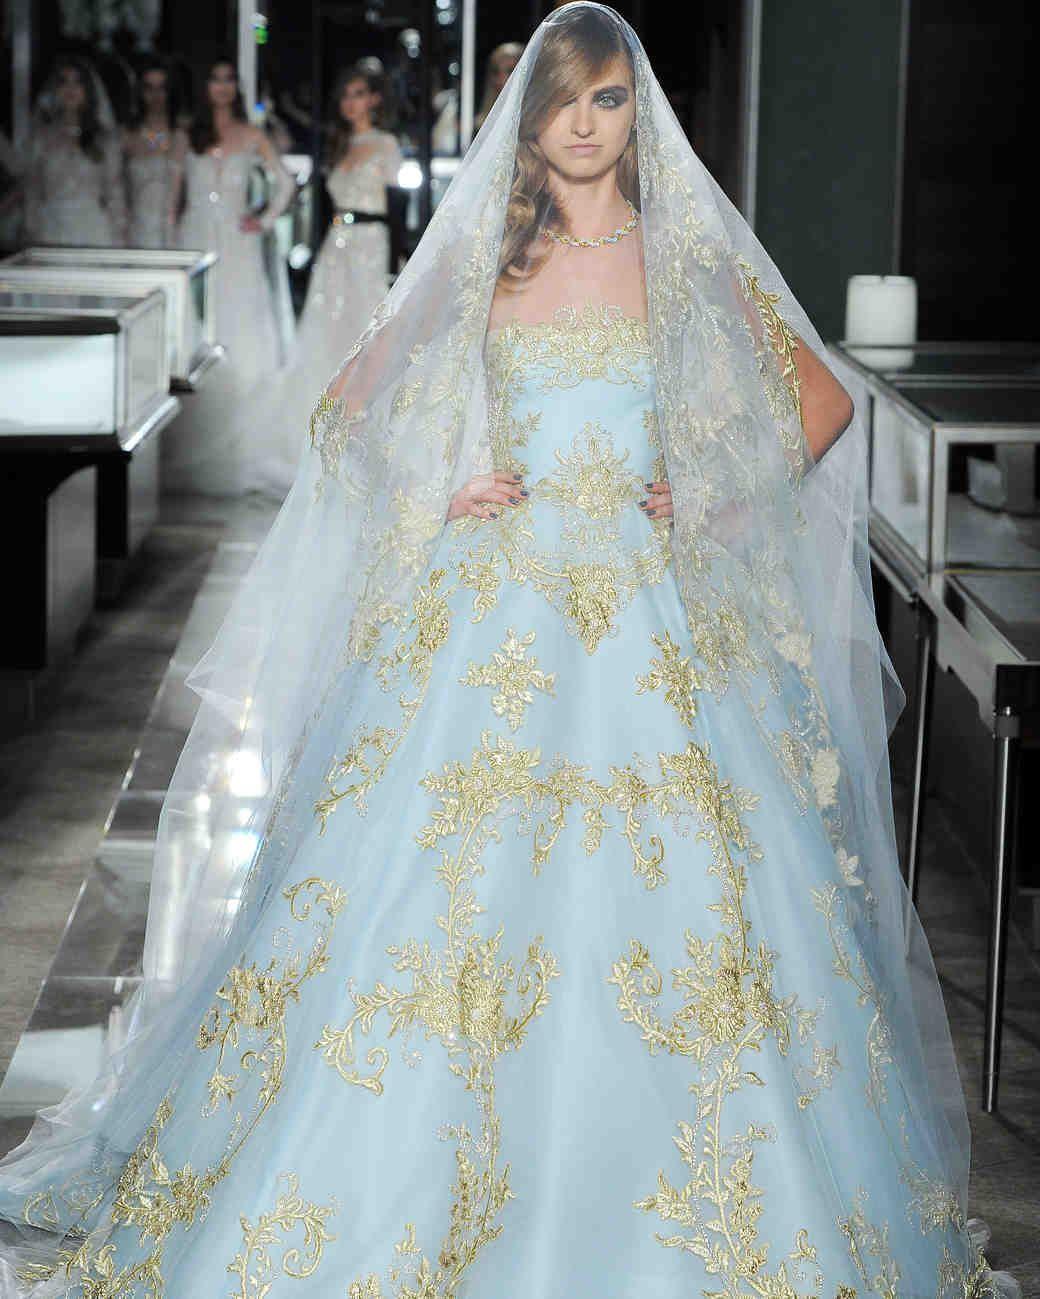 Reem Acra Spring 2018 Wedding Dress Collection Reem Acra Wedding Dress Reem Acra Bridal Bridal Fashion Week